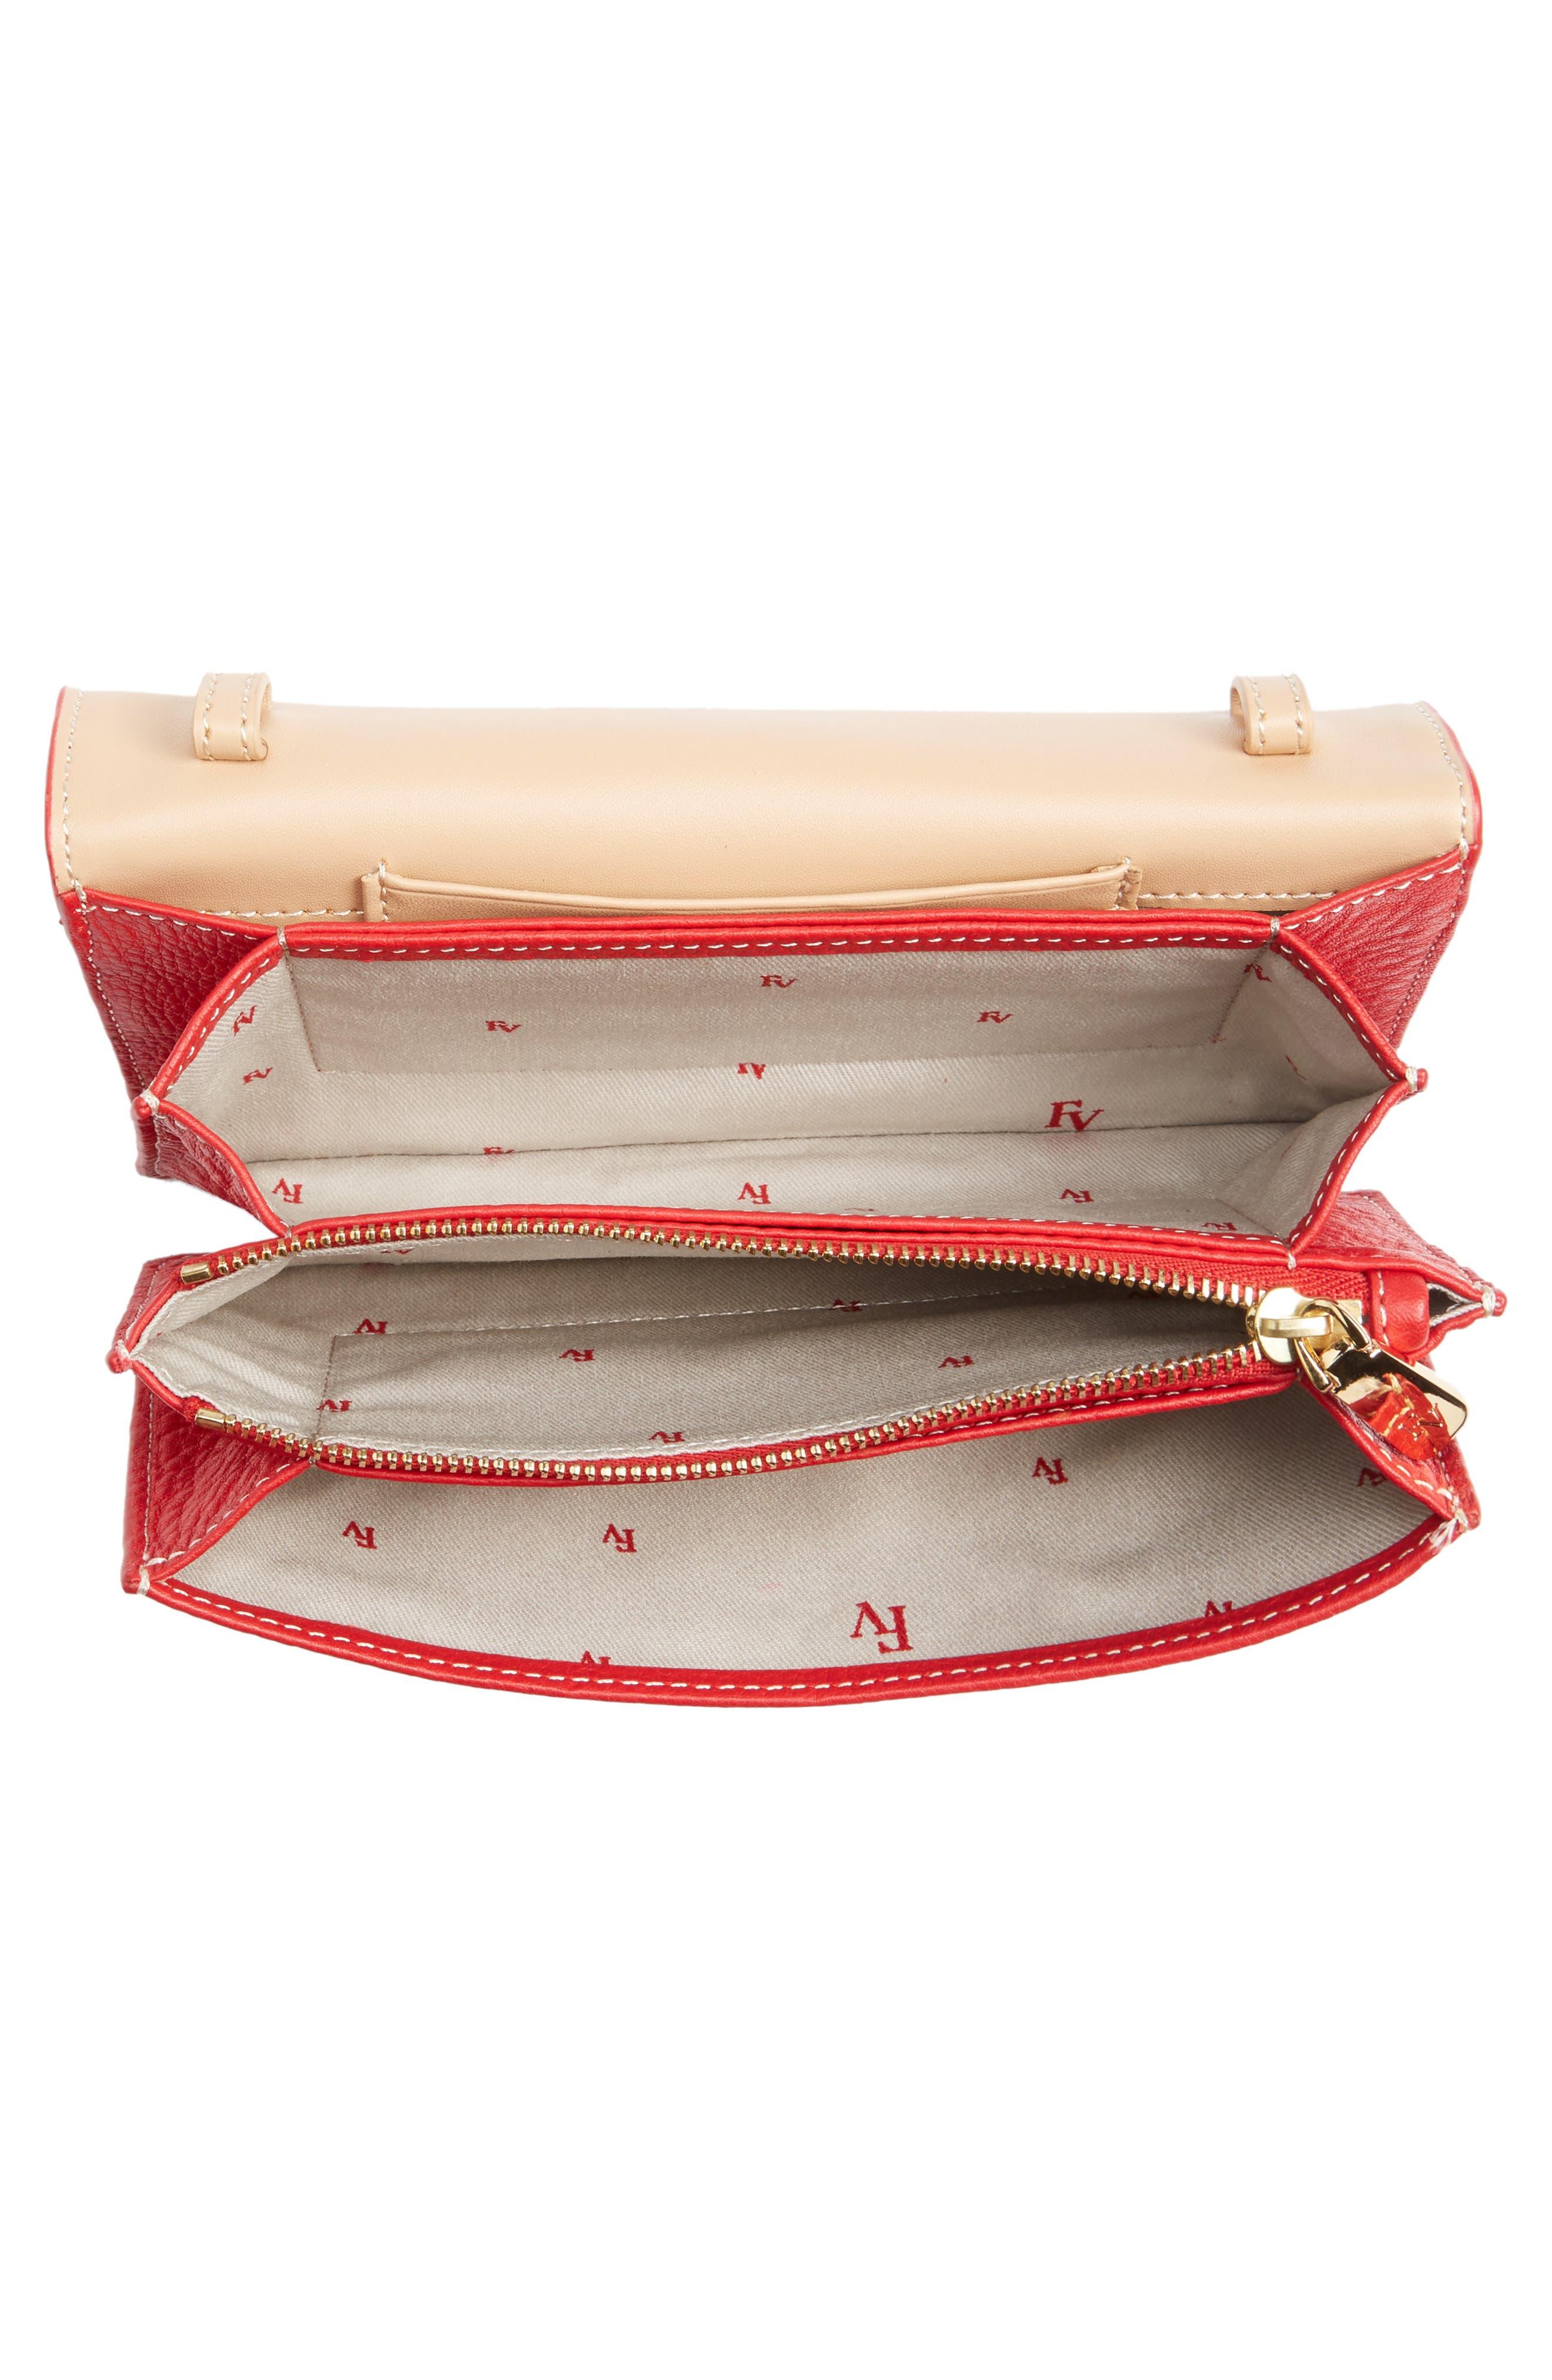 Calfskin Leather Crossbody Wallet,                             Alternate thumbnail 16, color,